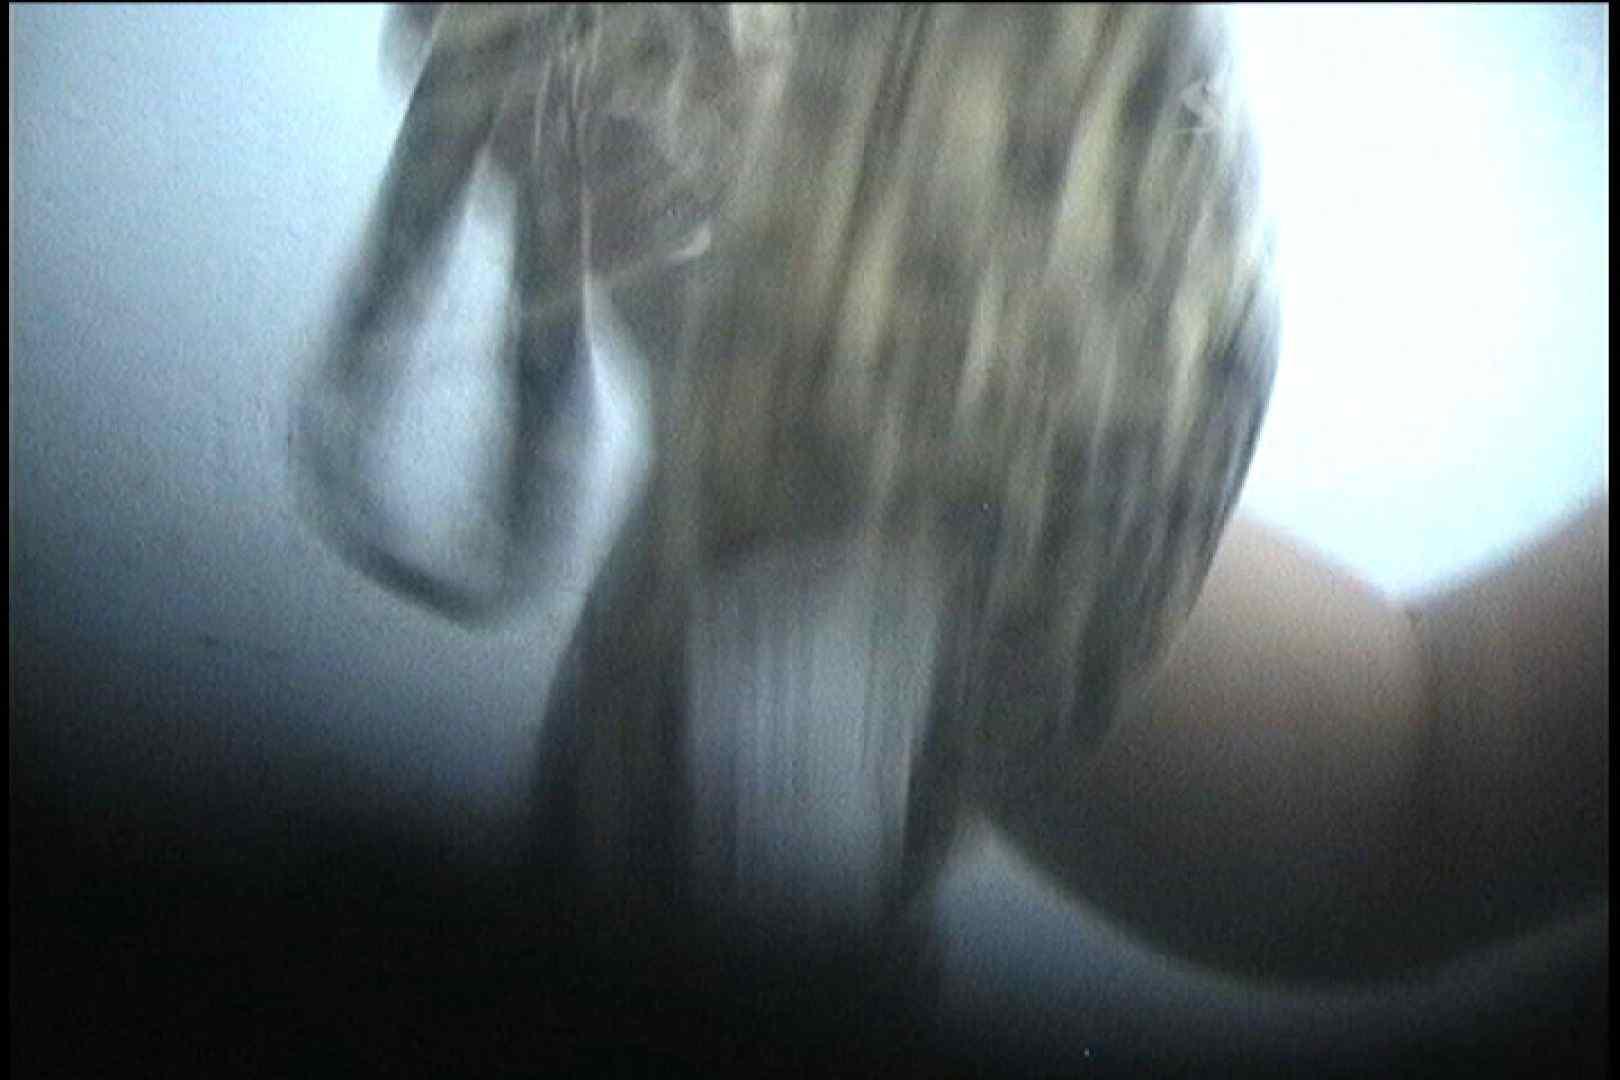 No.10 ヒョウガラ下着の茶髪美人、マッチの乗りそうなまつげです。 シャワー   お姉さん攻略  113画像 57